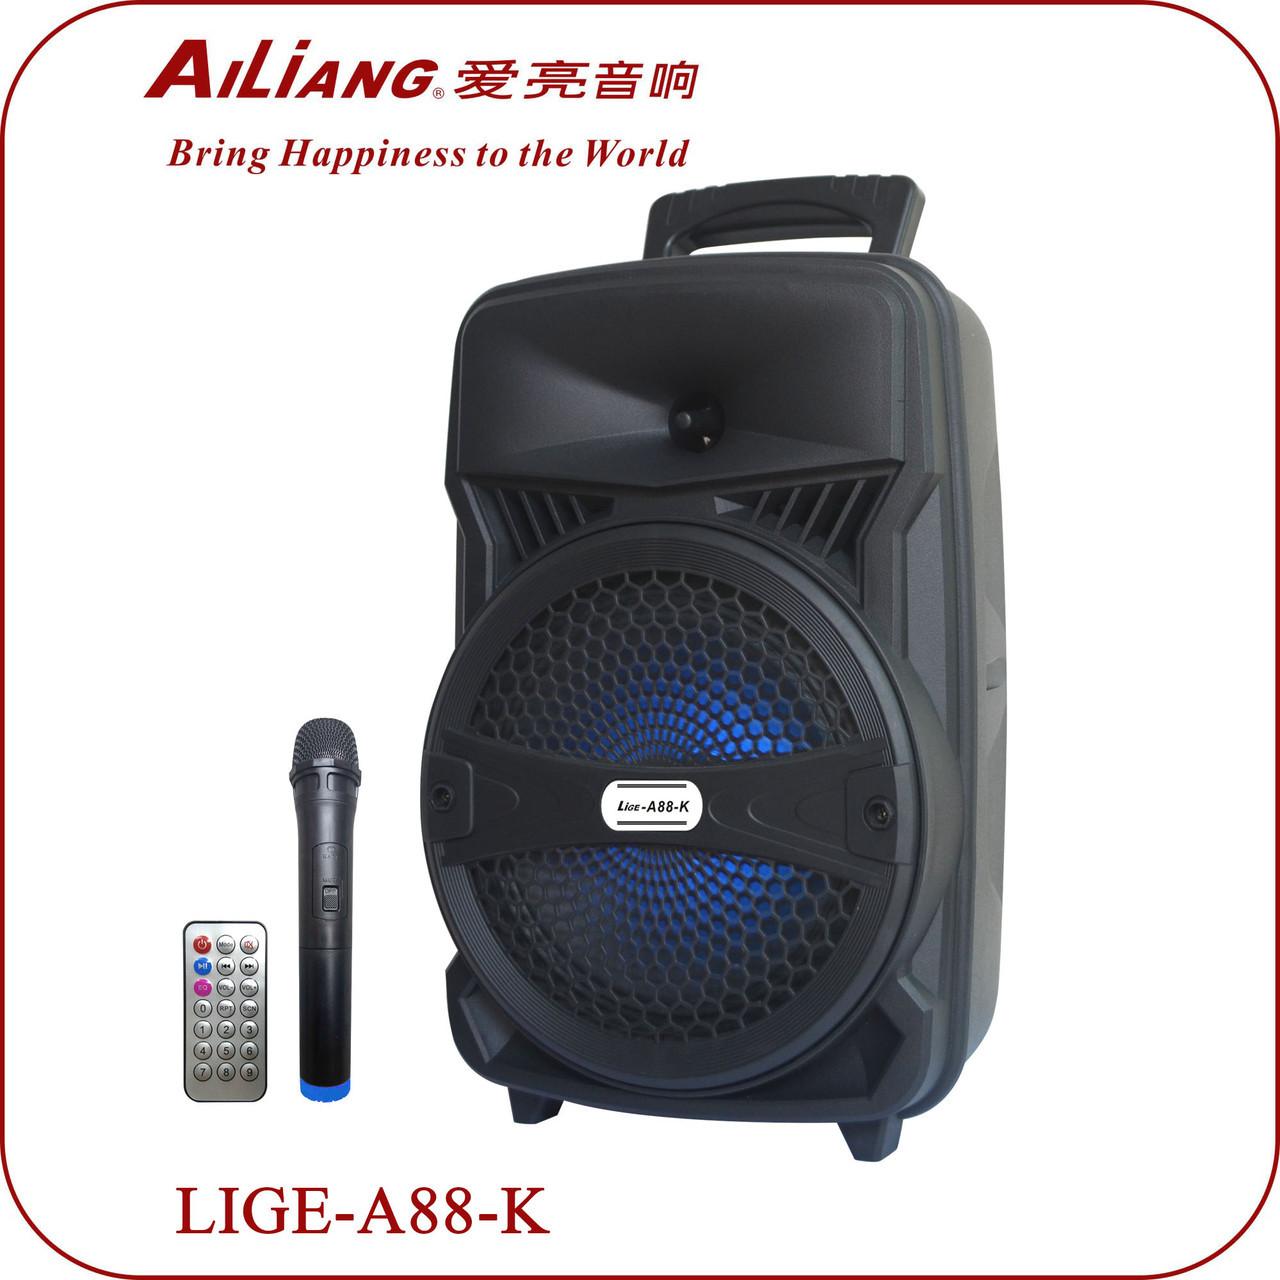 Акустическая система колонка Ailiang LiGE-A88-K